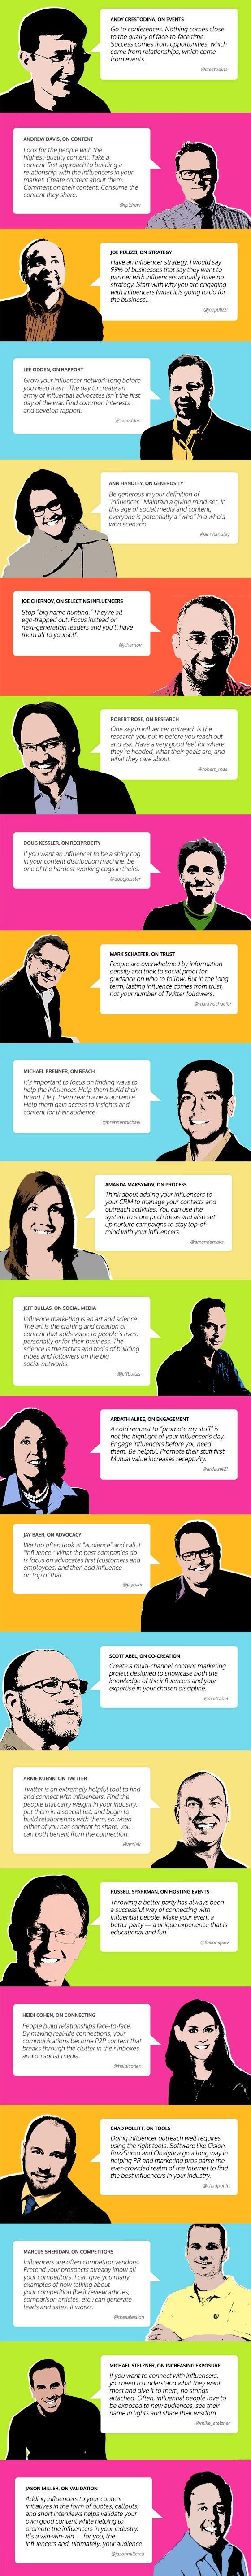 influencer-marketing-ideas-small1